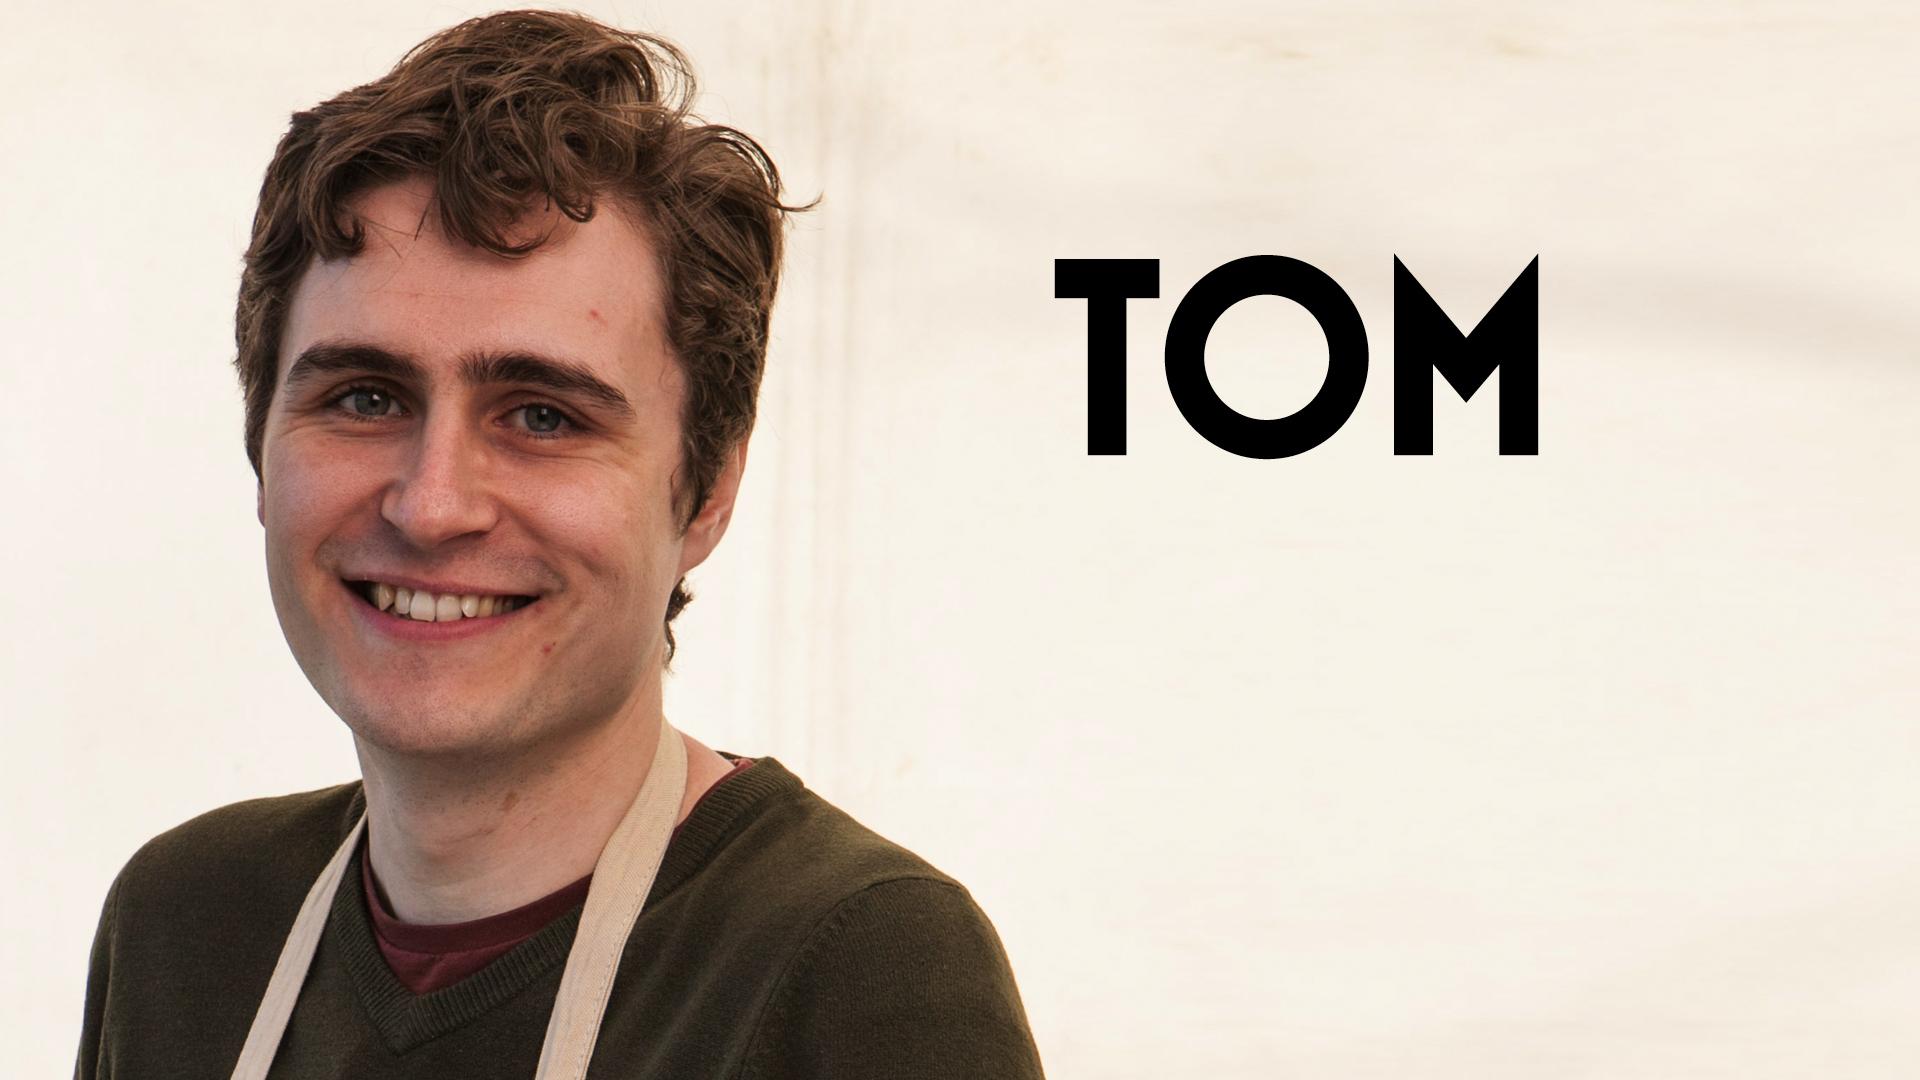 tom baker meet and great elsa